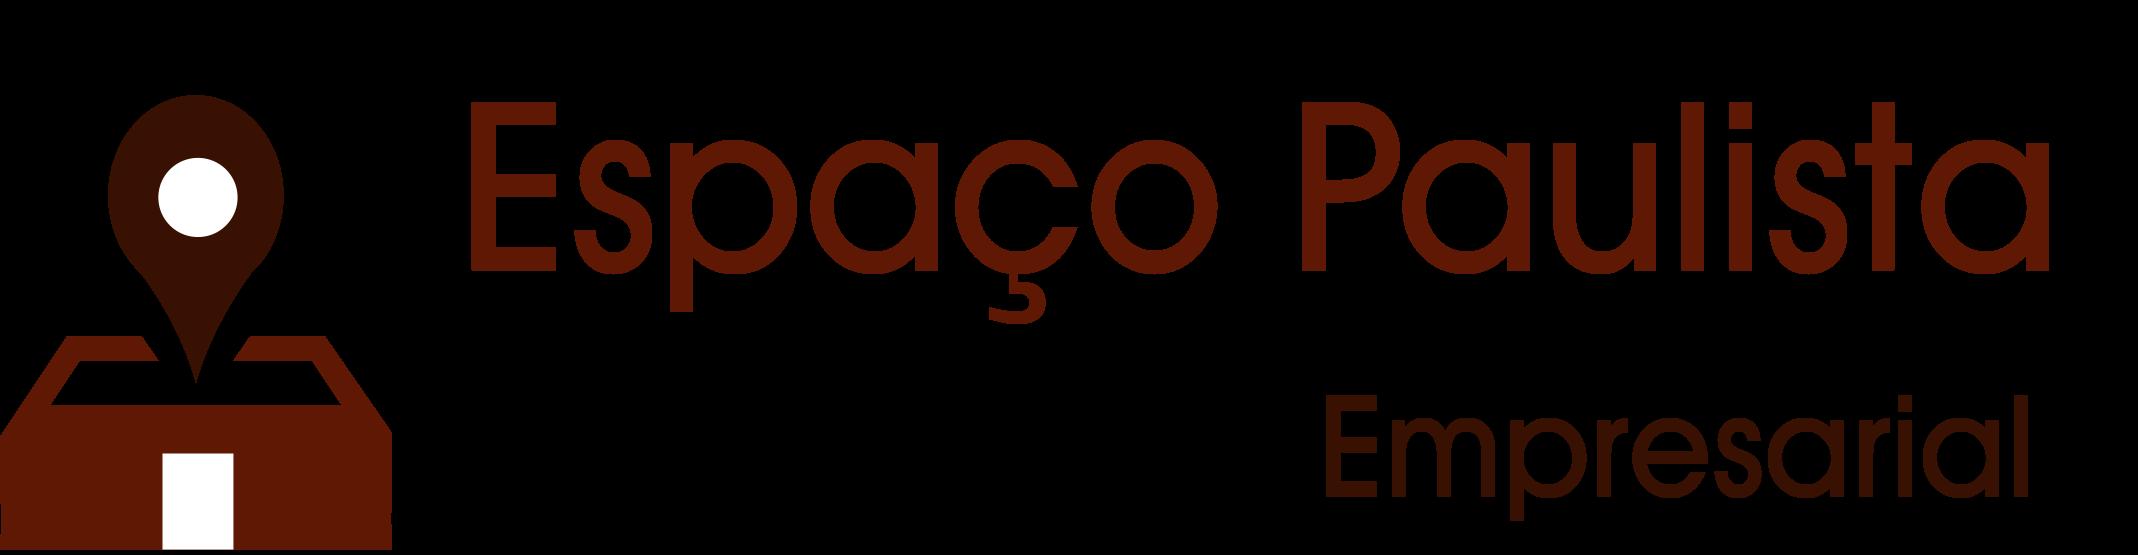 Espaço Paulista